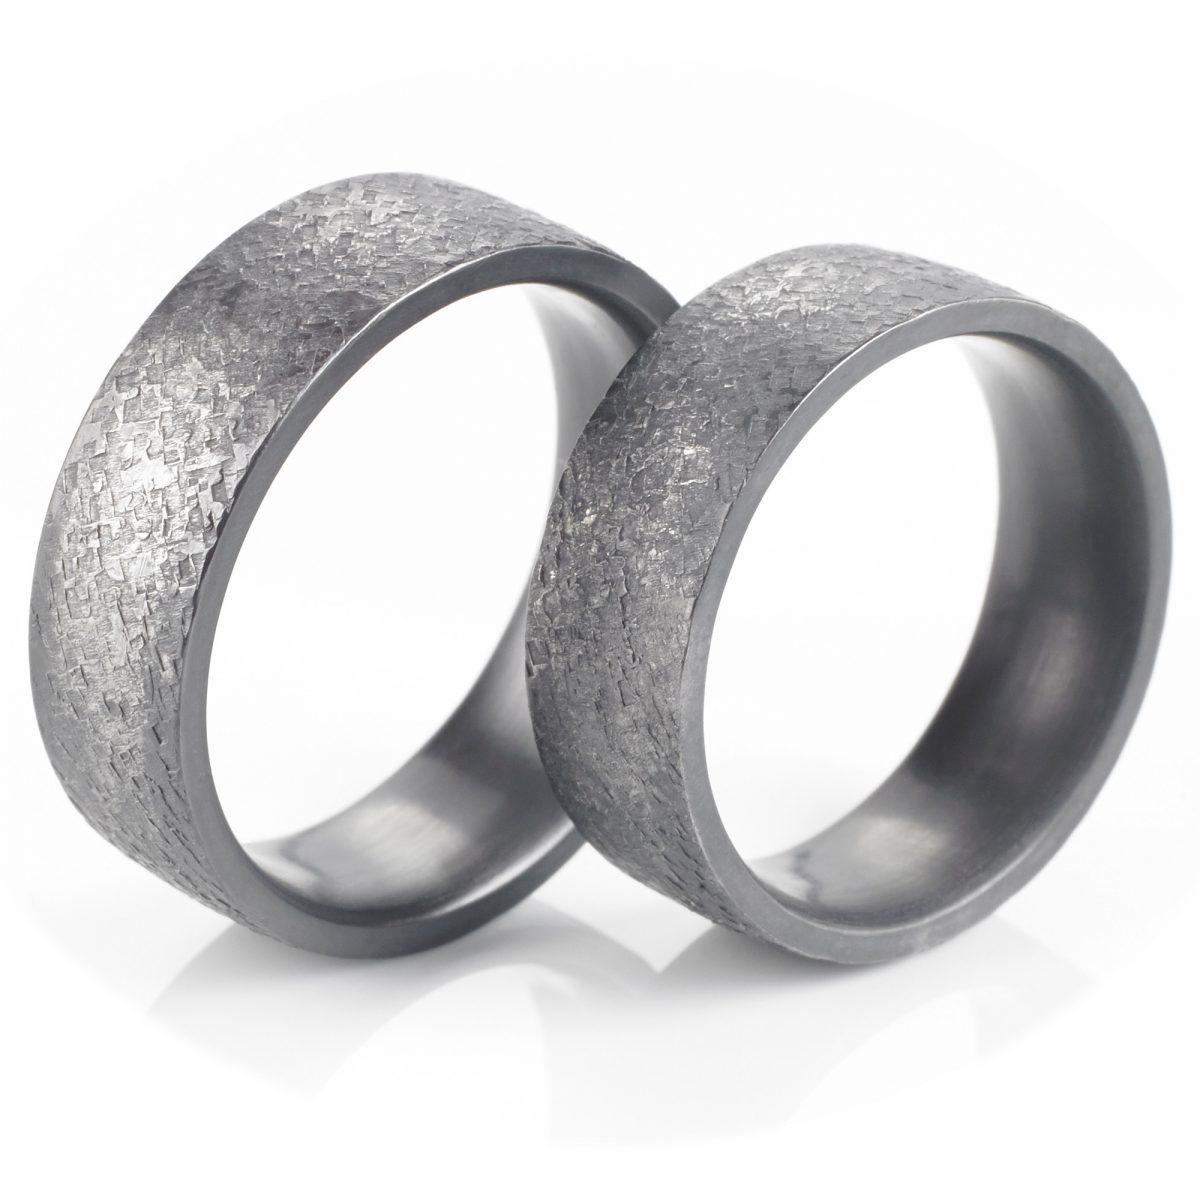 Tantal Ringpaar | Tantal Eheringe True Love Collection No:18